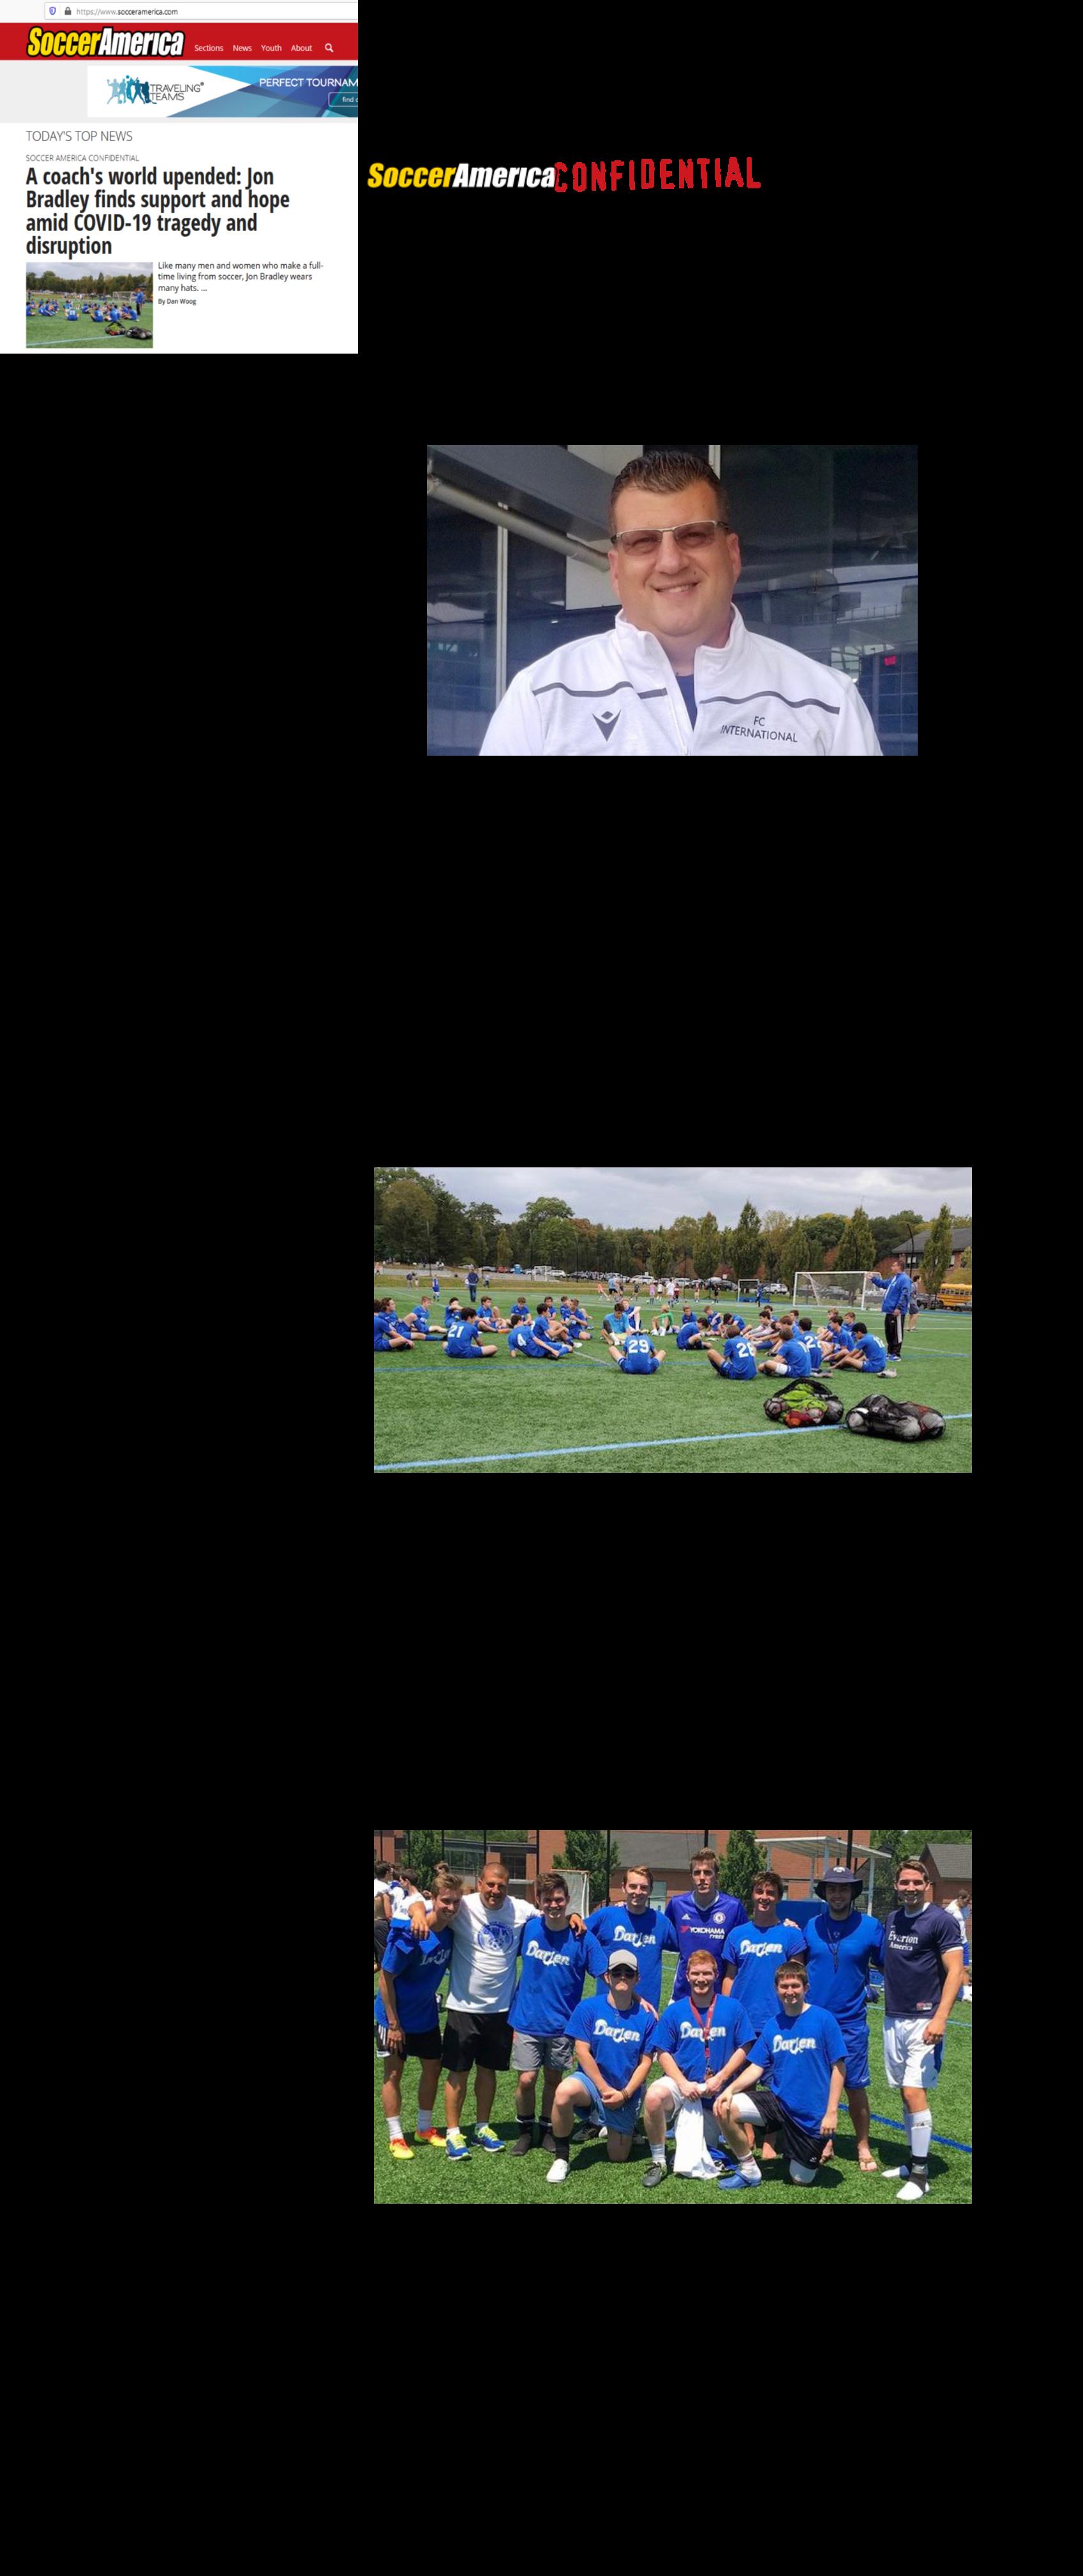 Soccer America Article